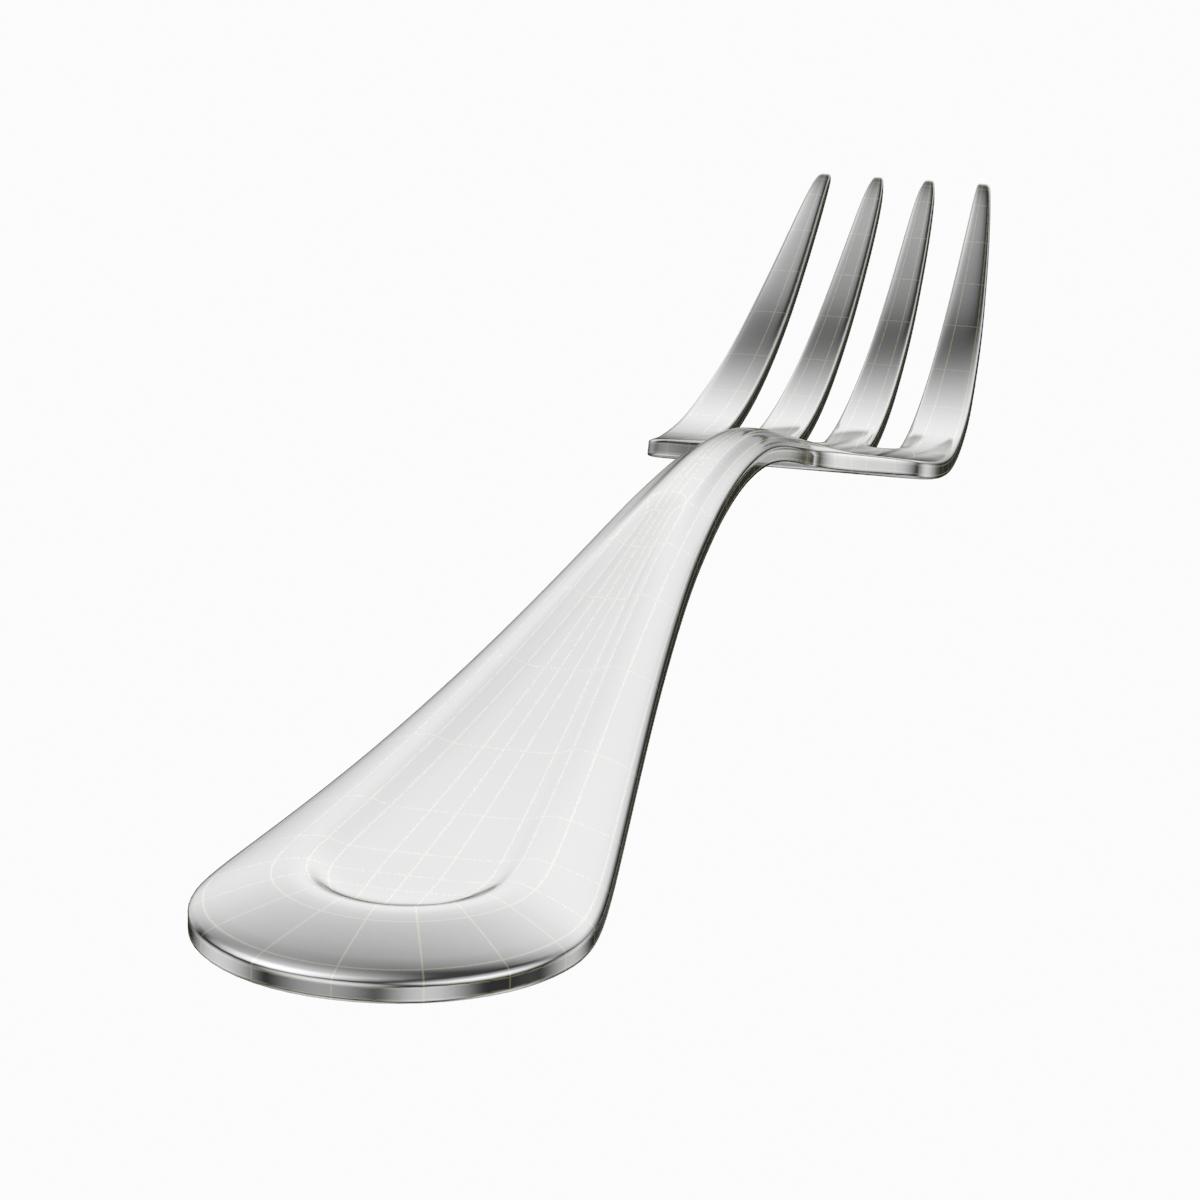 dessert knife and fork classic cutlery 3d model 3ds c4d fbx max max ma mb obj txt png stl 285943